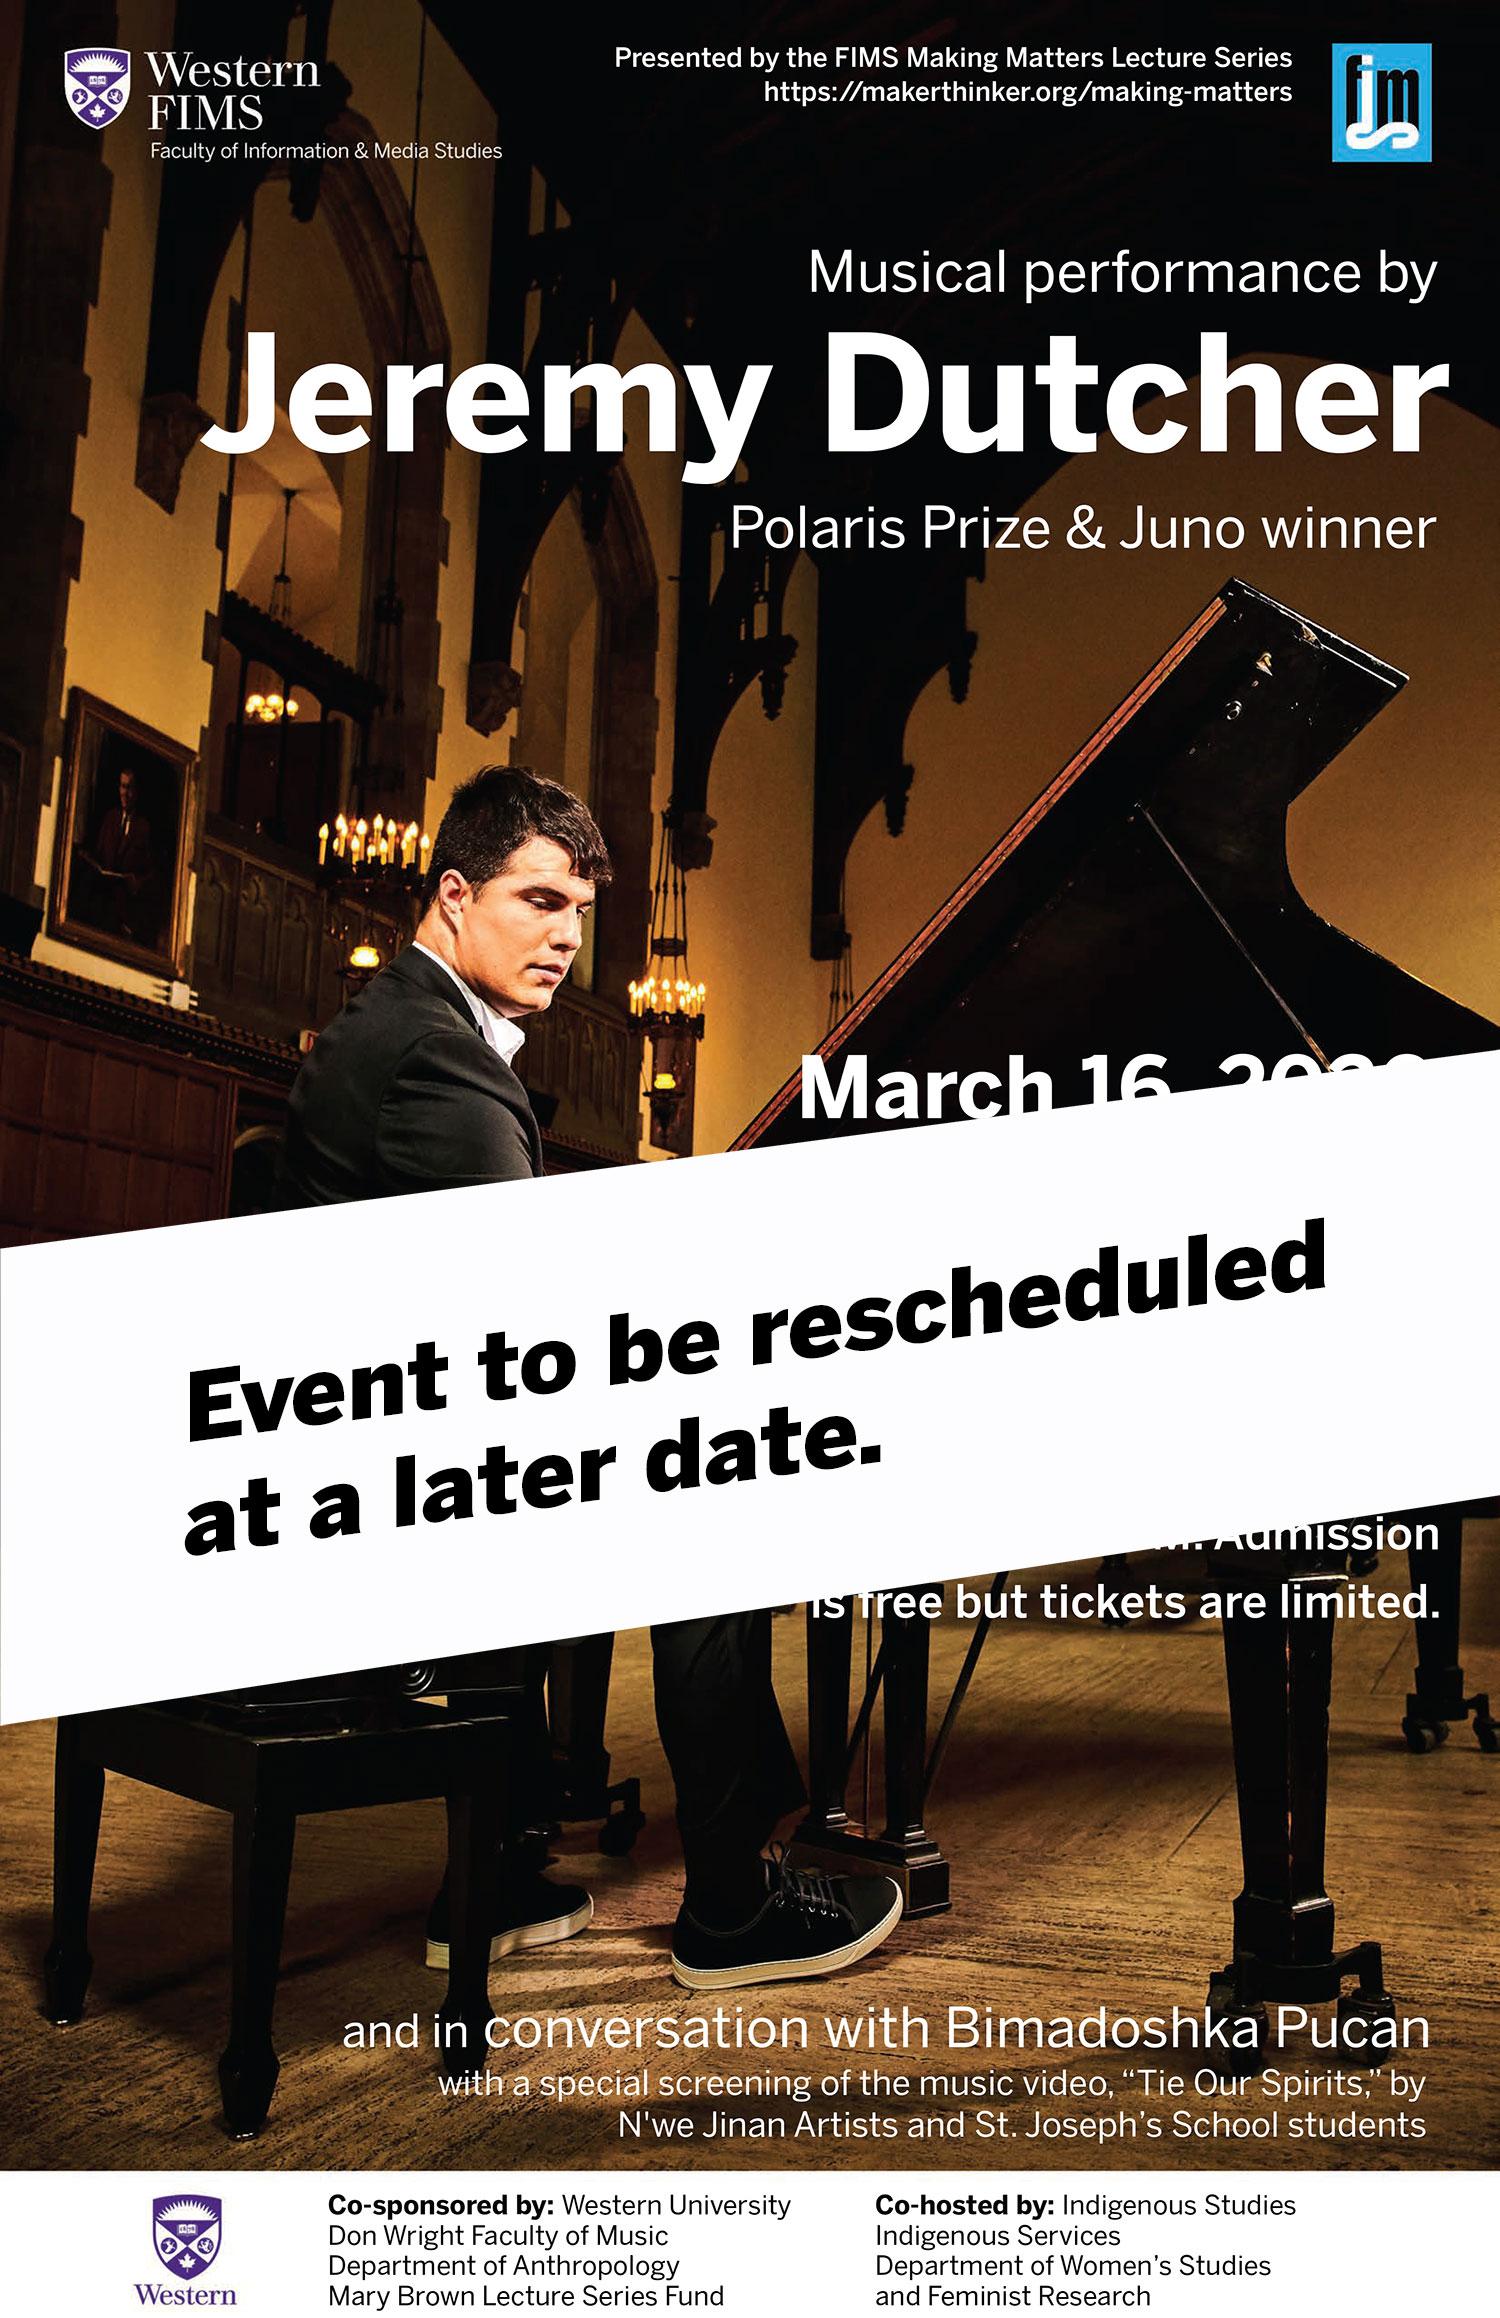 Jeremy Dutcher event poster